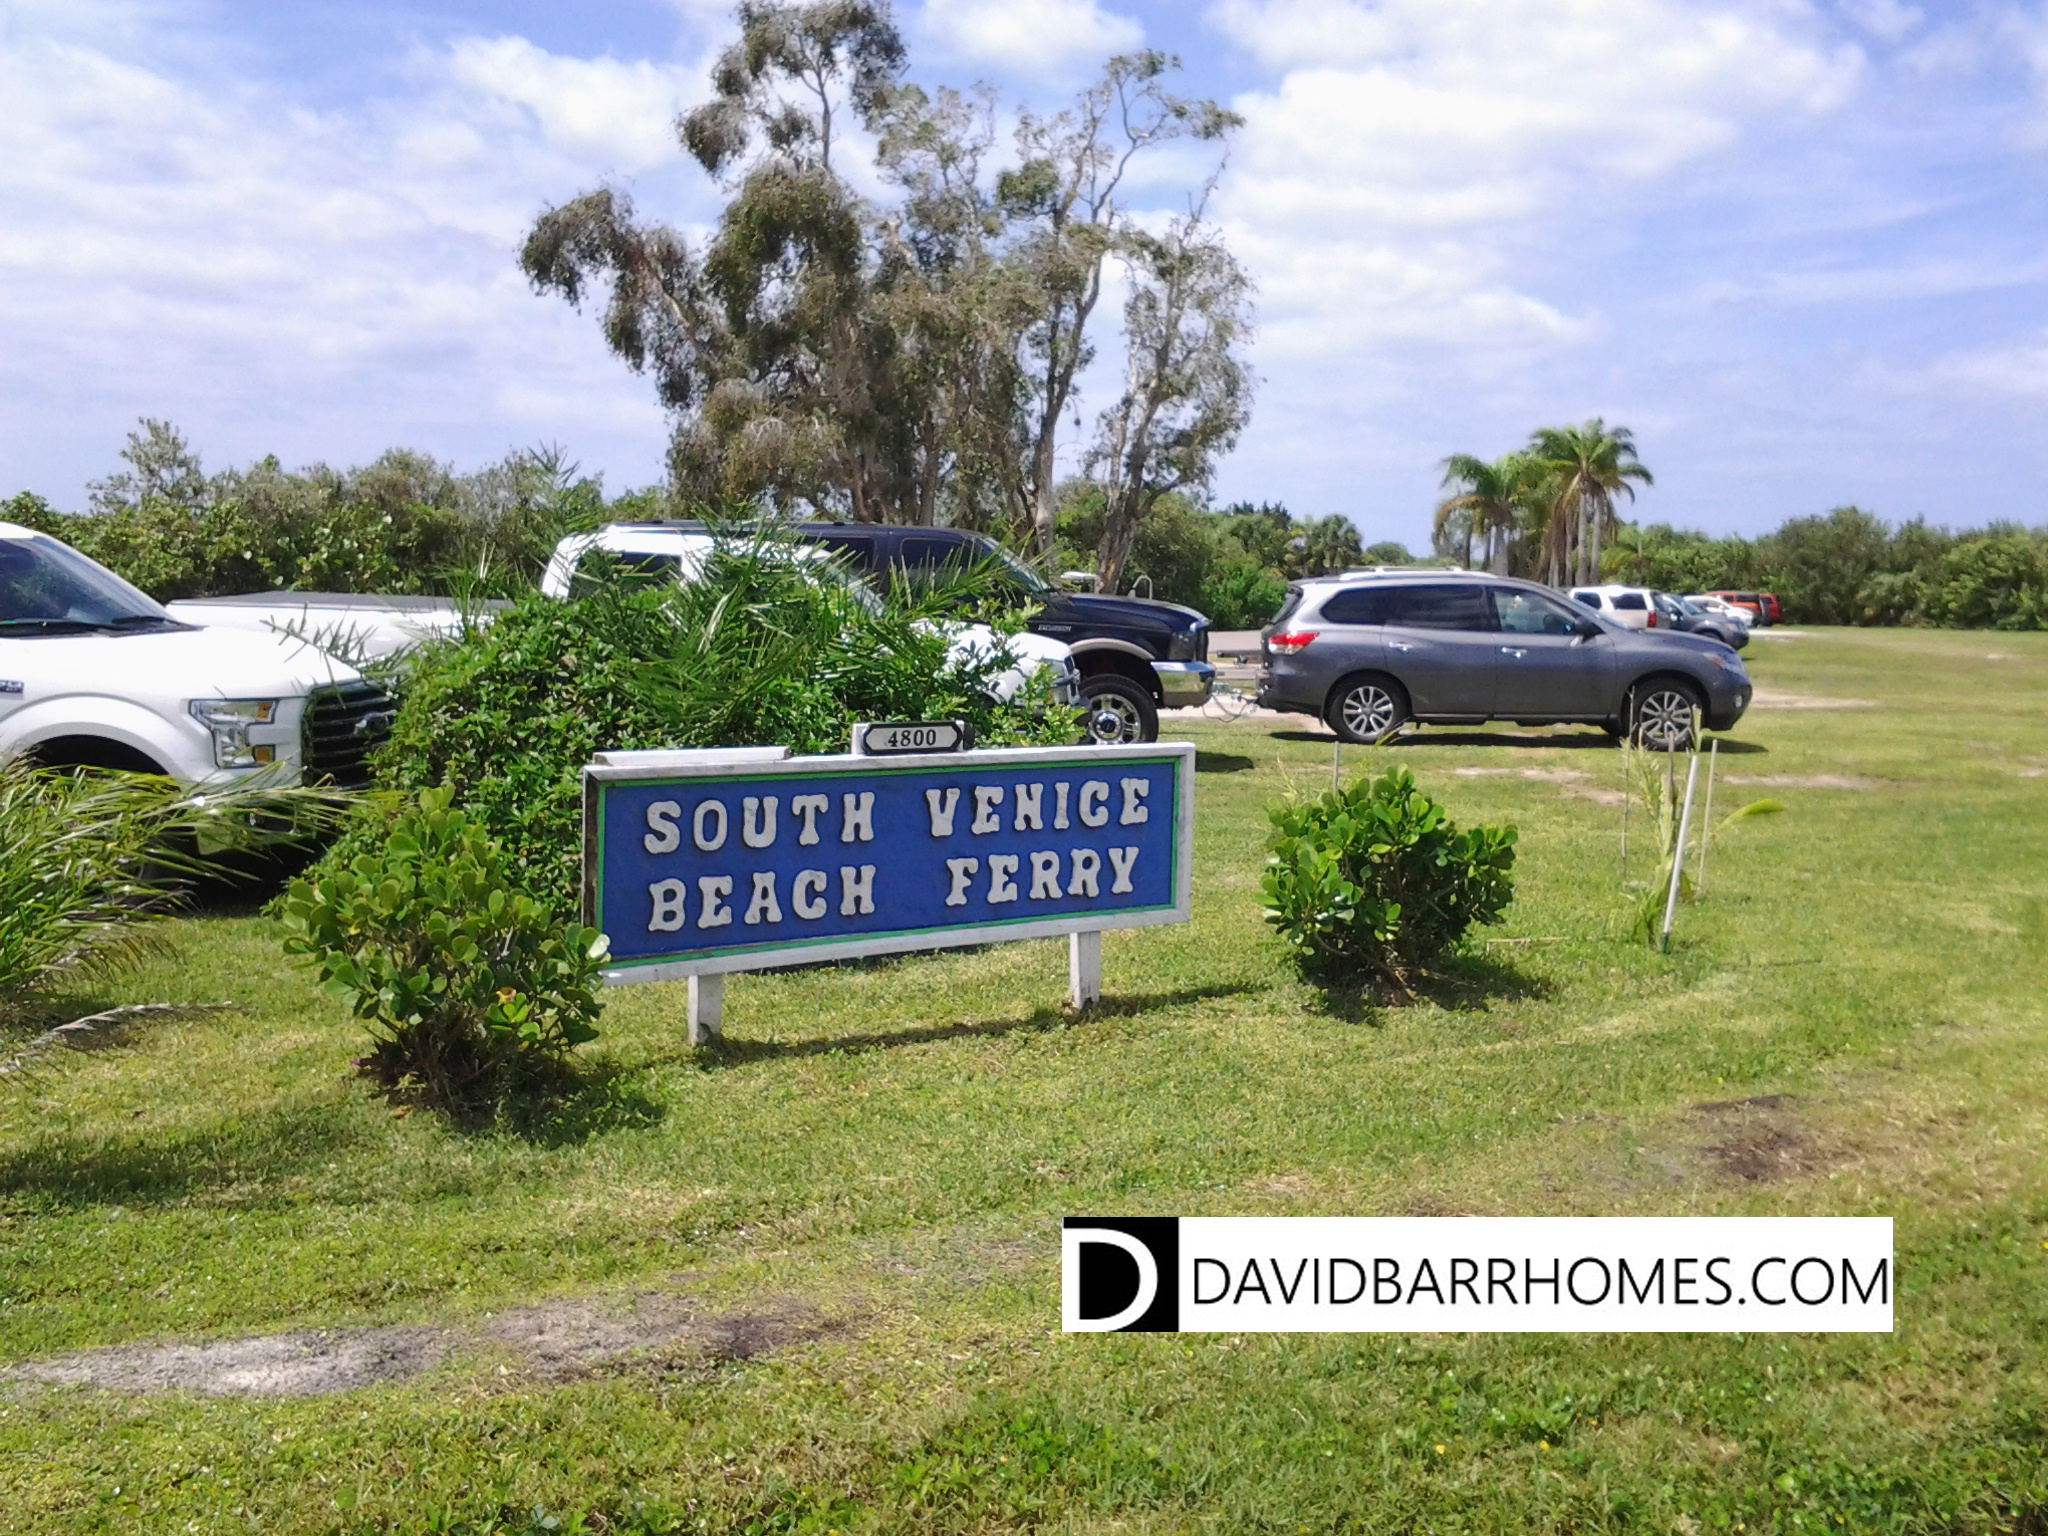 South Venice beach ferry